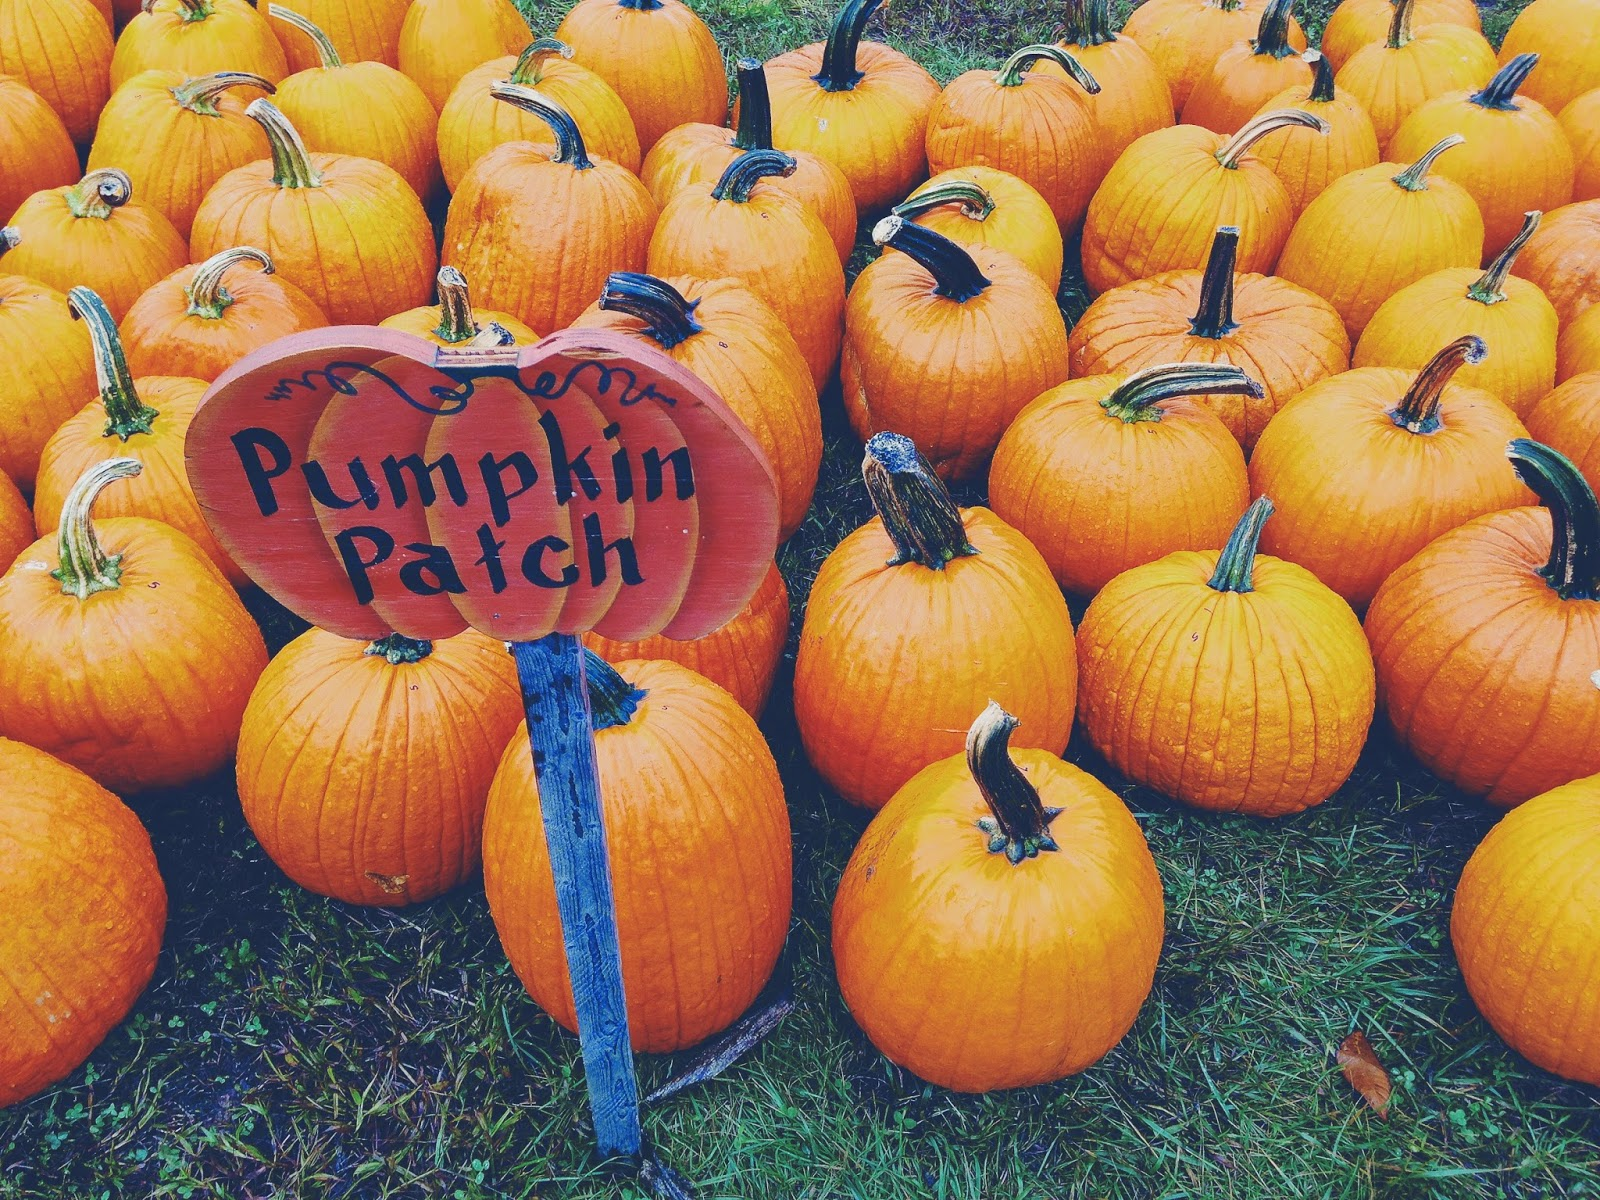 pumpkin patch personal trip Mom shares horrifying photo of legs after trip to pumpkin patch share alex lasker, aolcom  kikkik medium leather personal planner buy it.